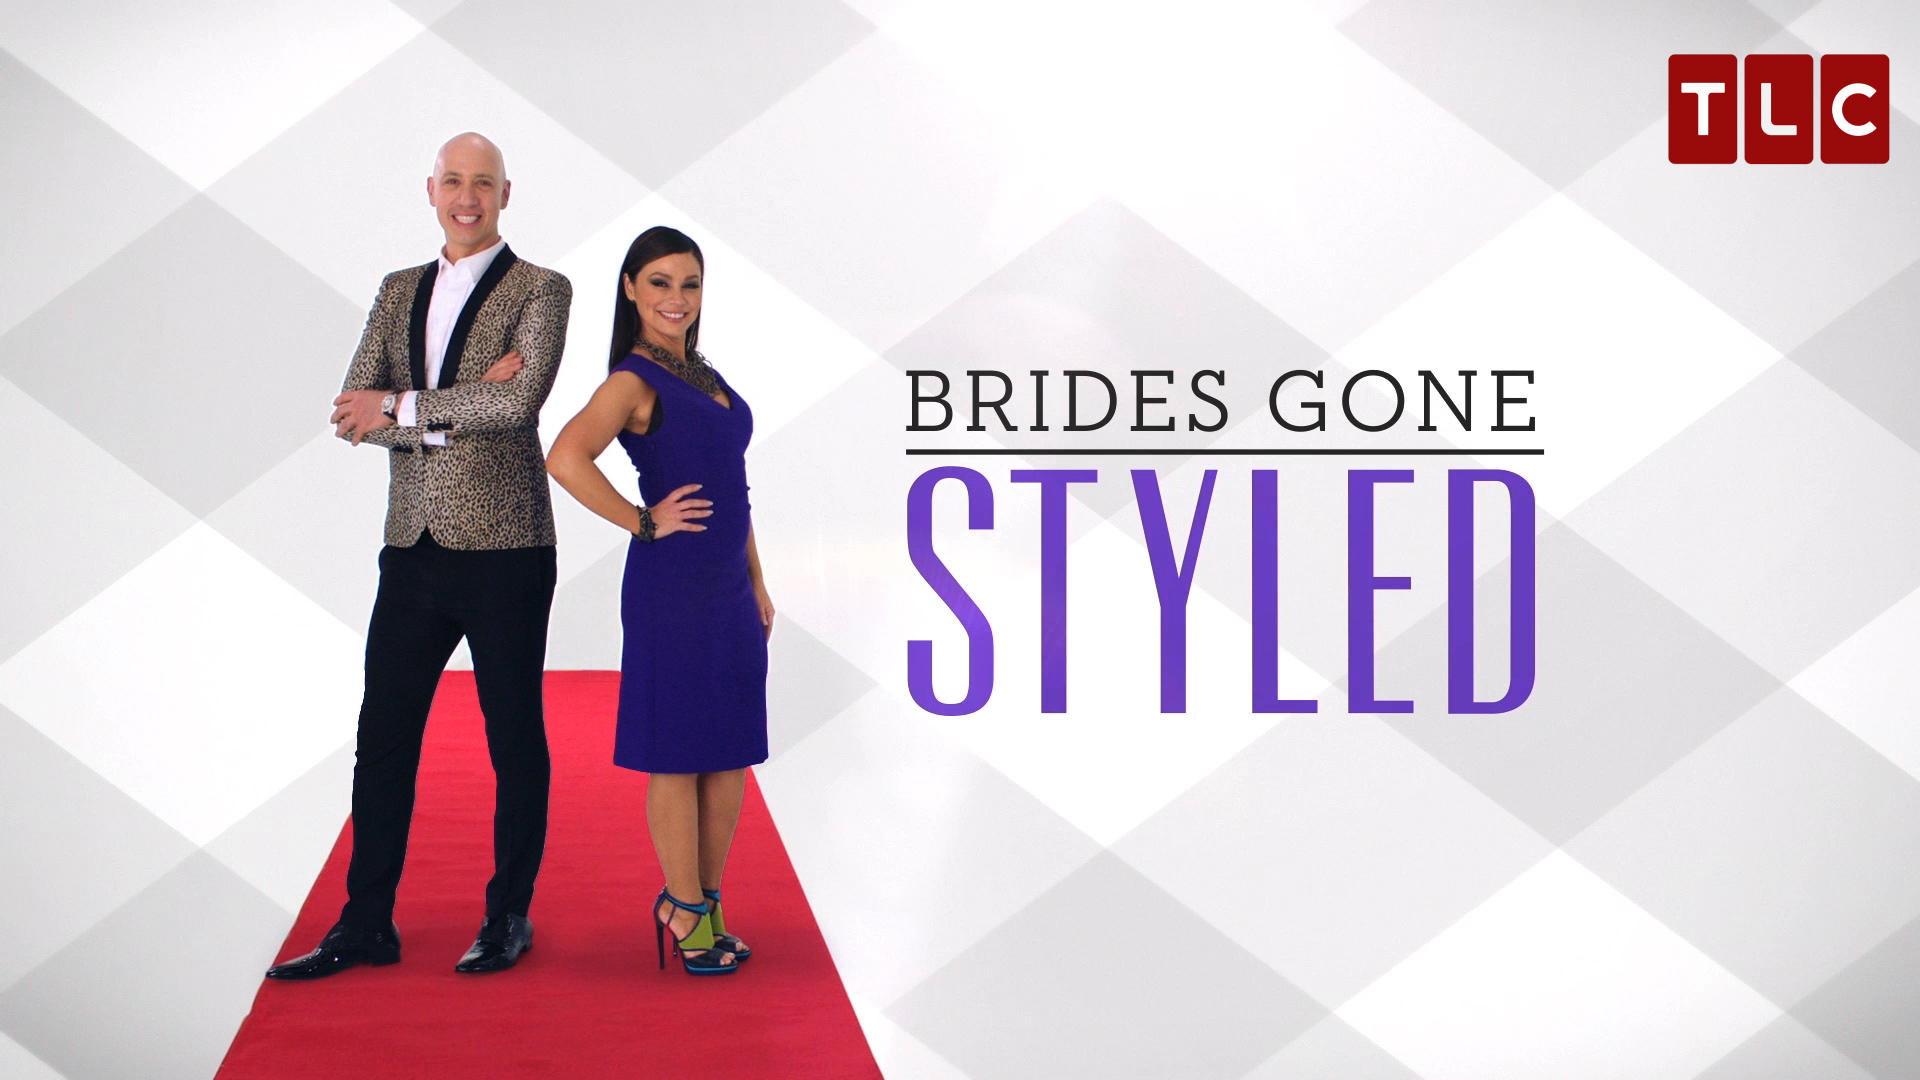 Celebrity stylists Gretta Monahan & Robert Verdi of Brides Gone Styled on TLC.